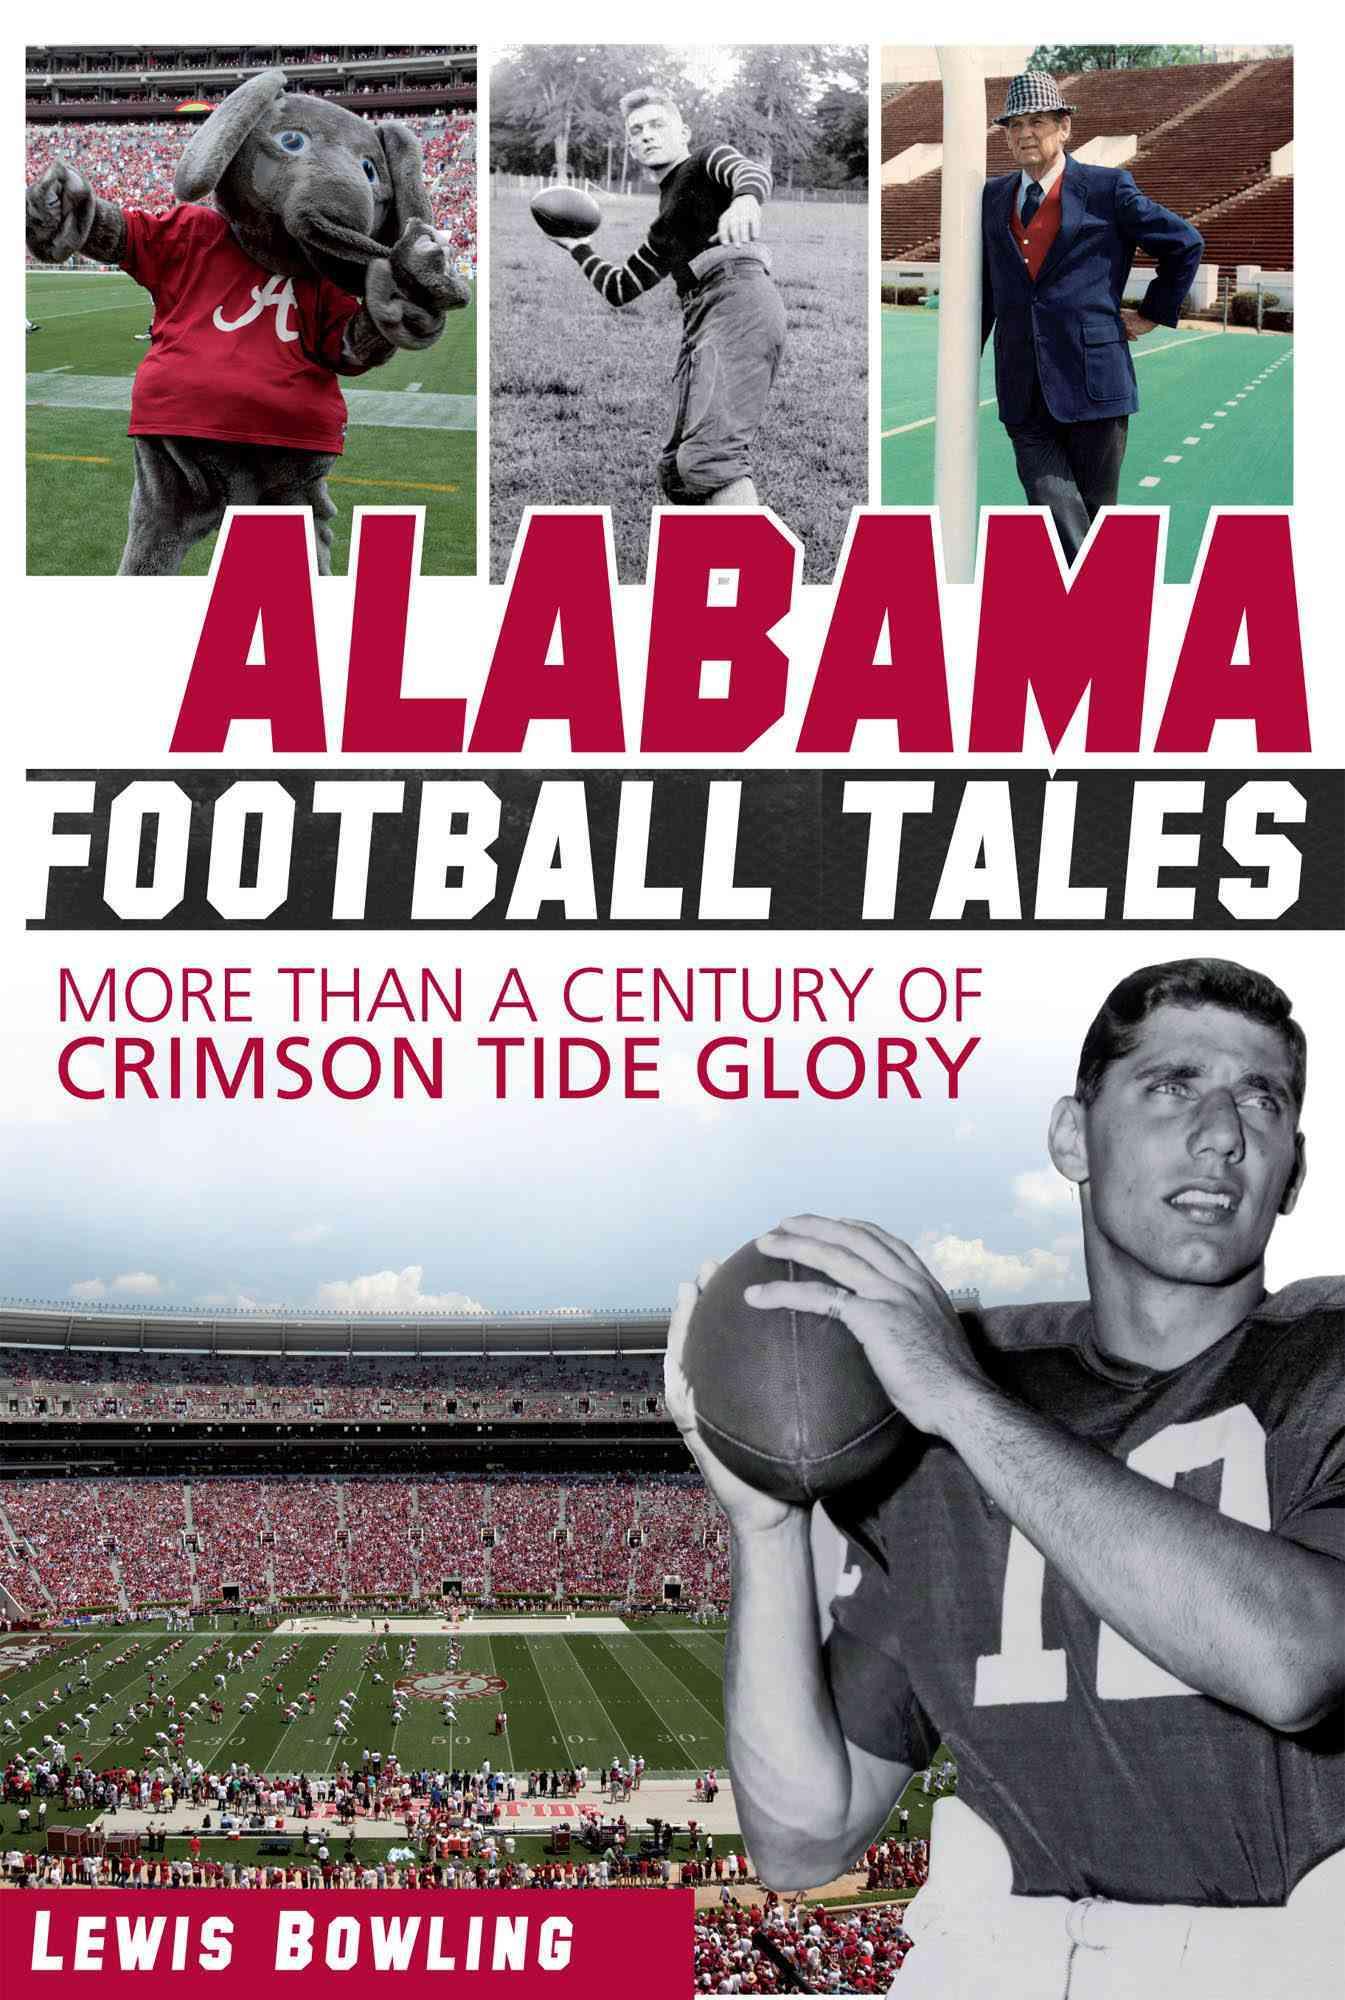 Alabama Football Tales: More Than a Century of Crimson Tide Glory (Paperback)